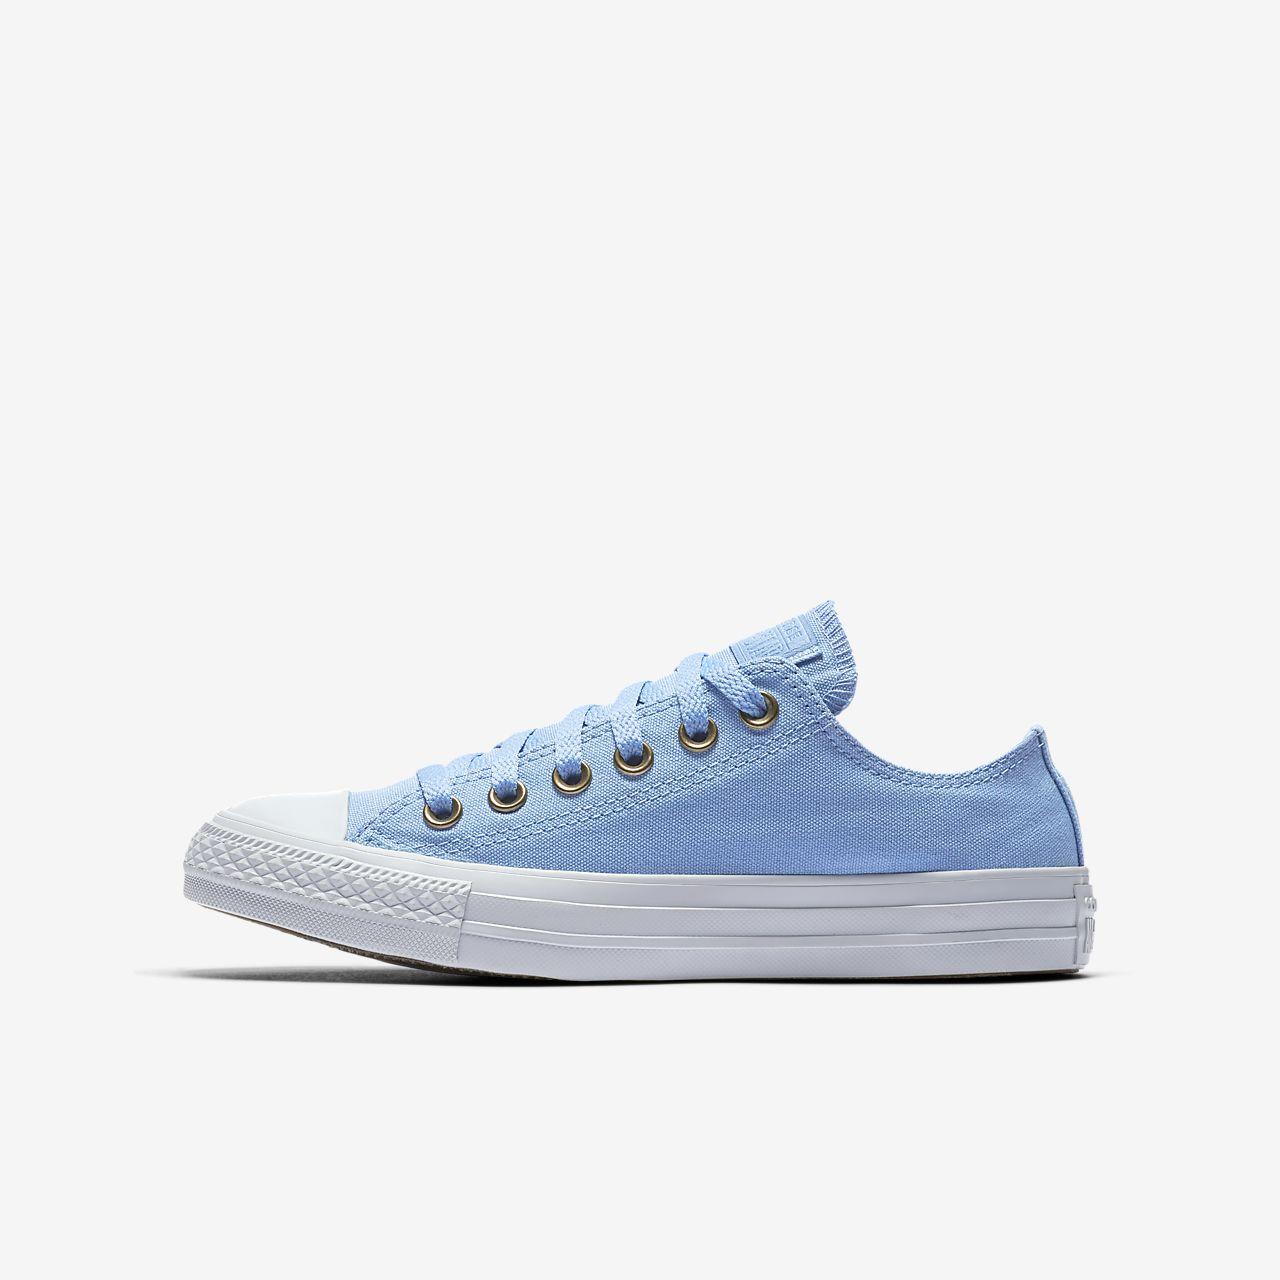 Converse Chuck Taylor All Star Botanical Neutrals Low Top Women's Shoe